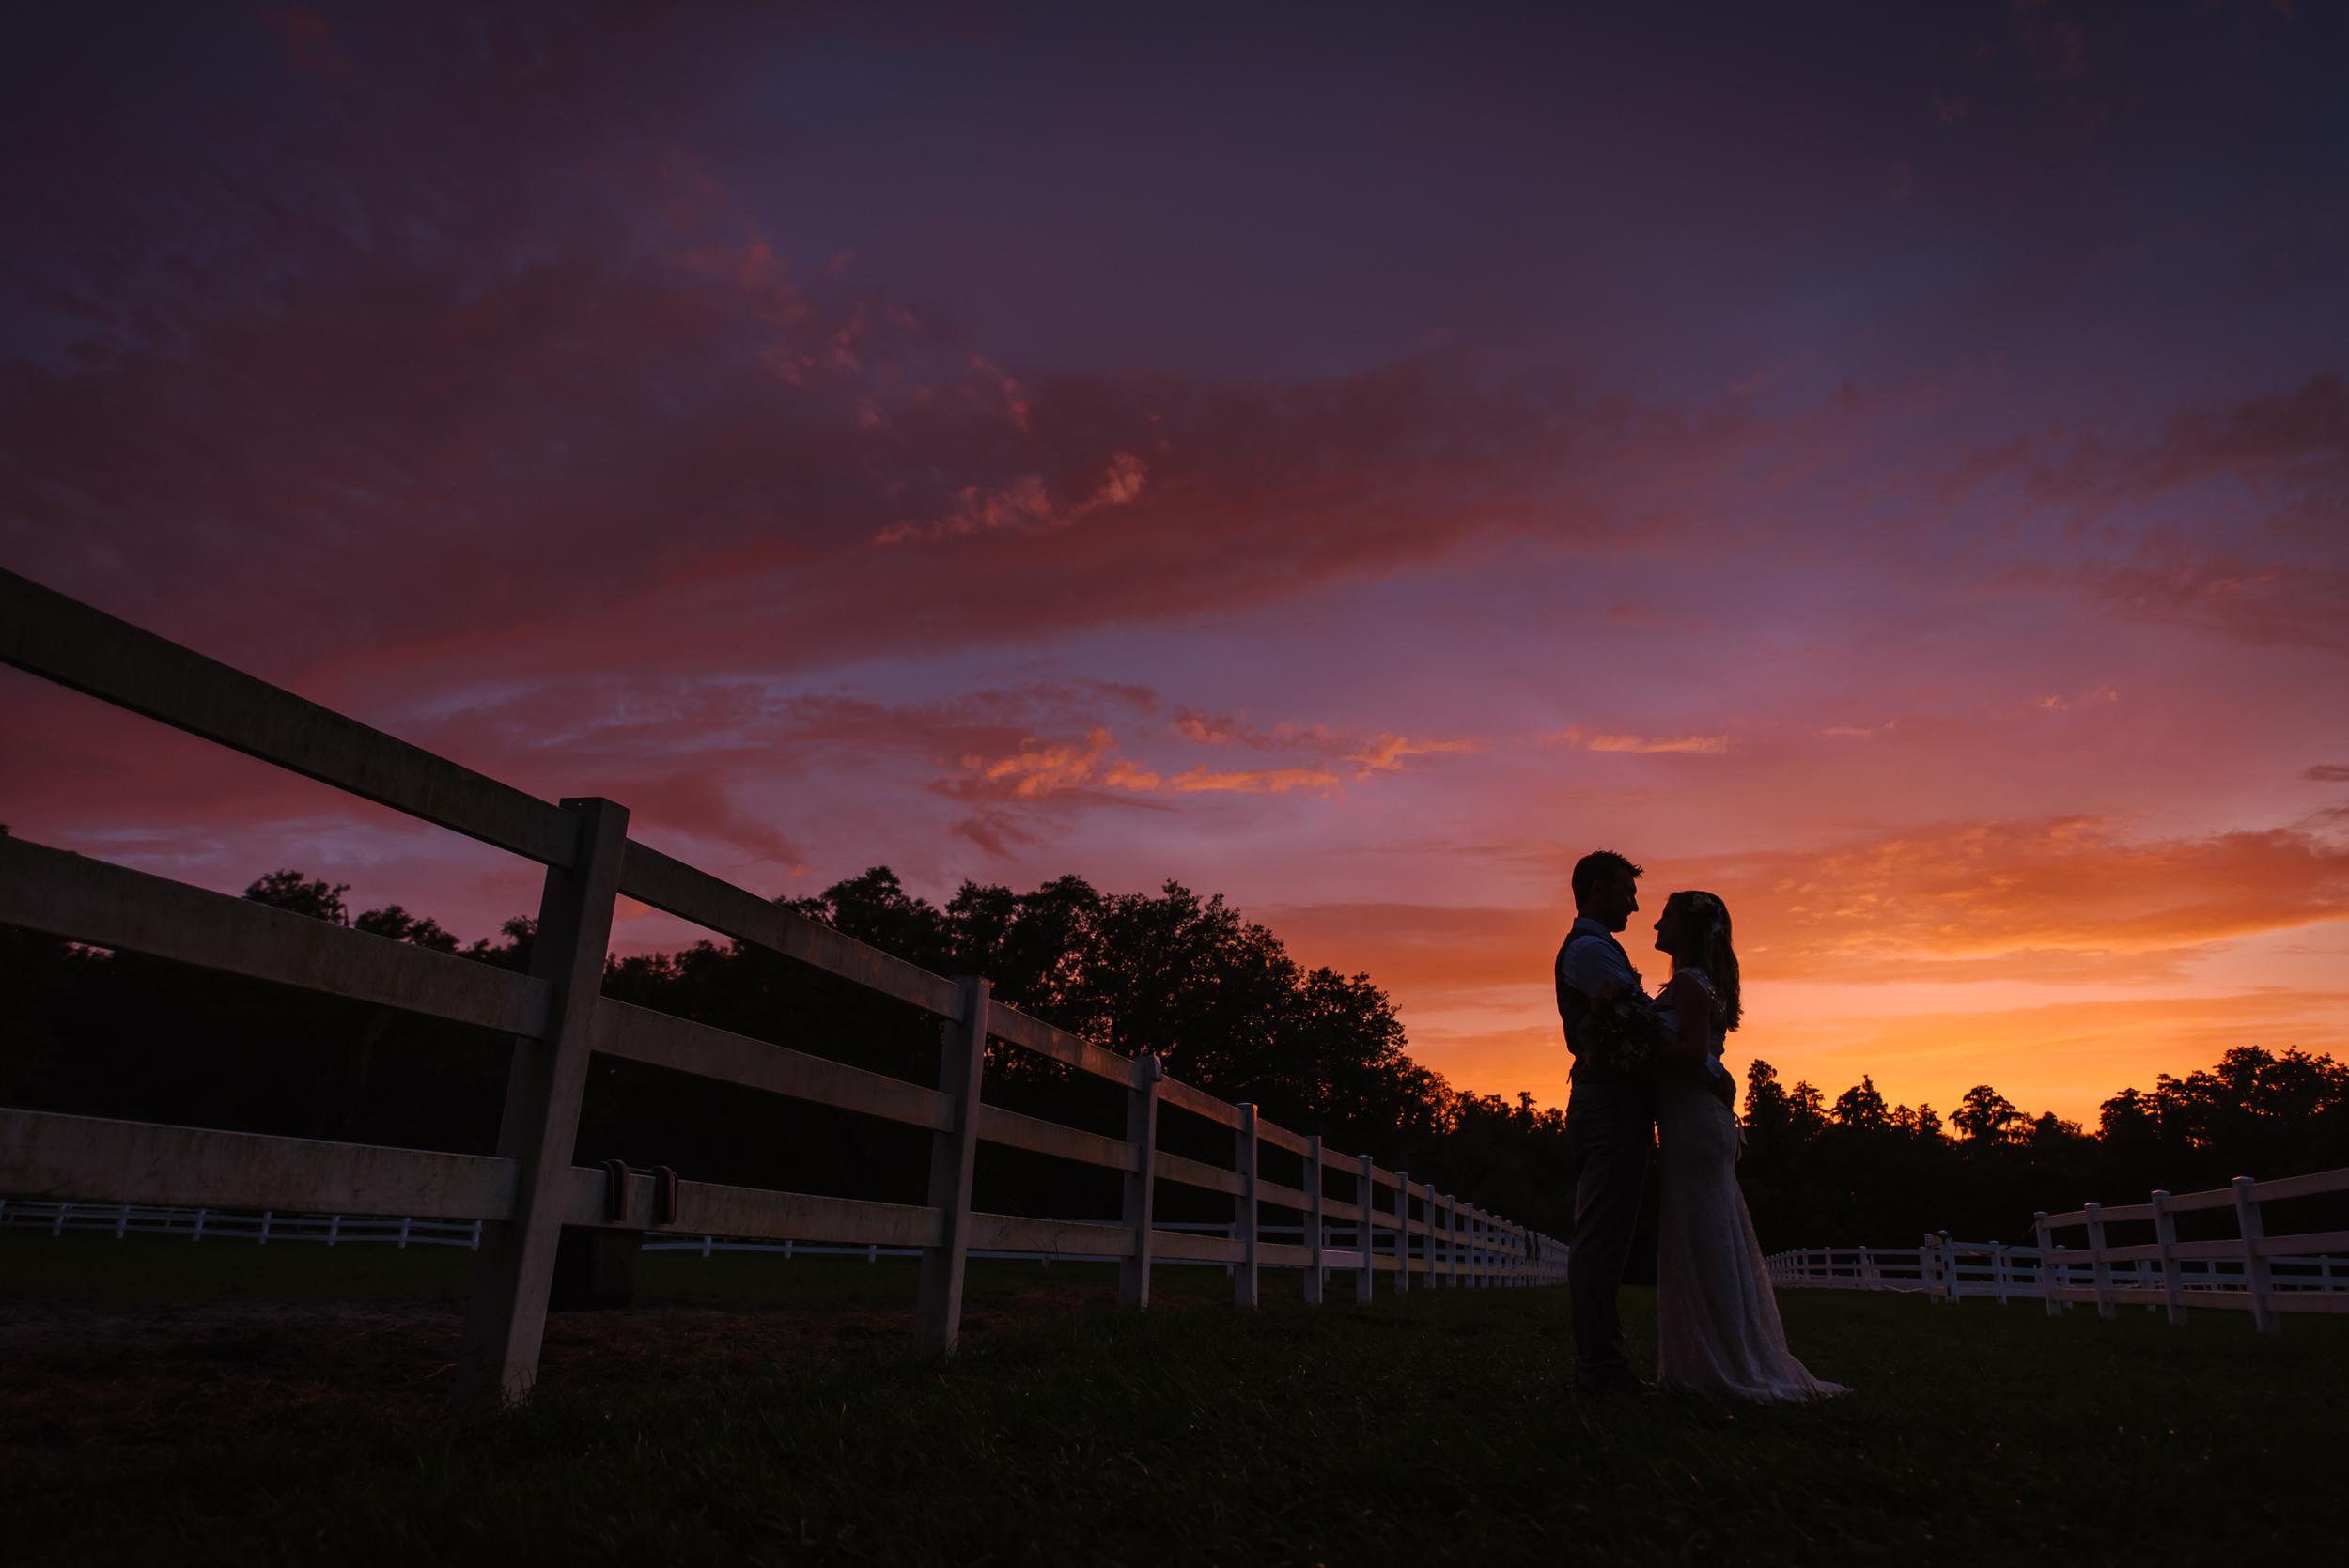 tampa-wedding-photographer-lange-farm-sunset-silhouette-bride-groom-portrait-romantic-evening-night